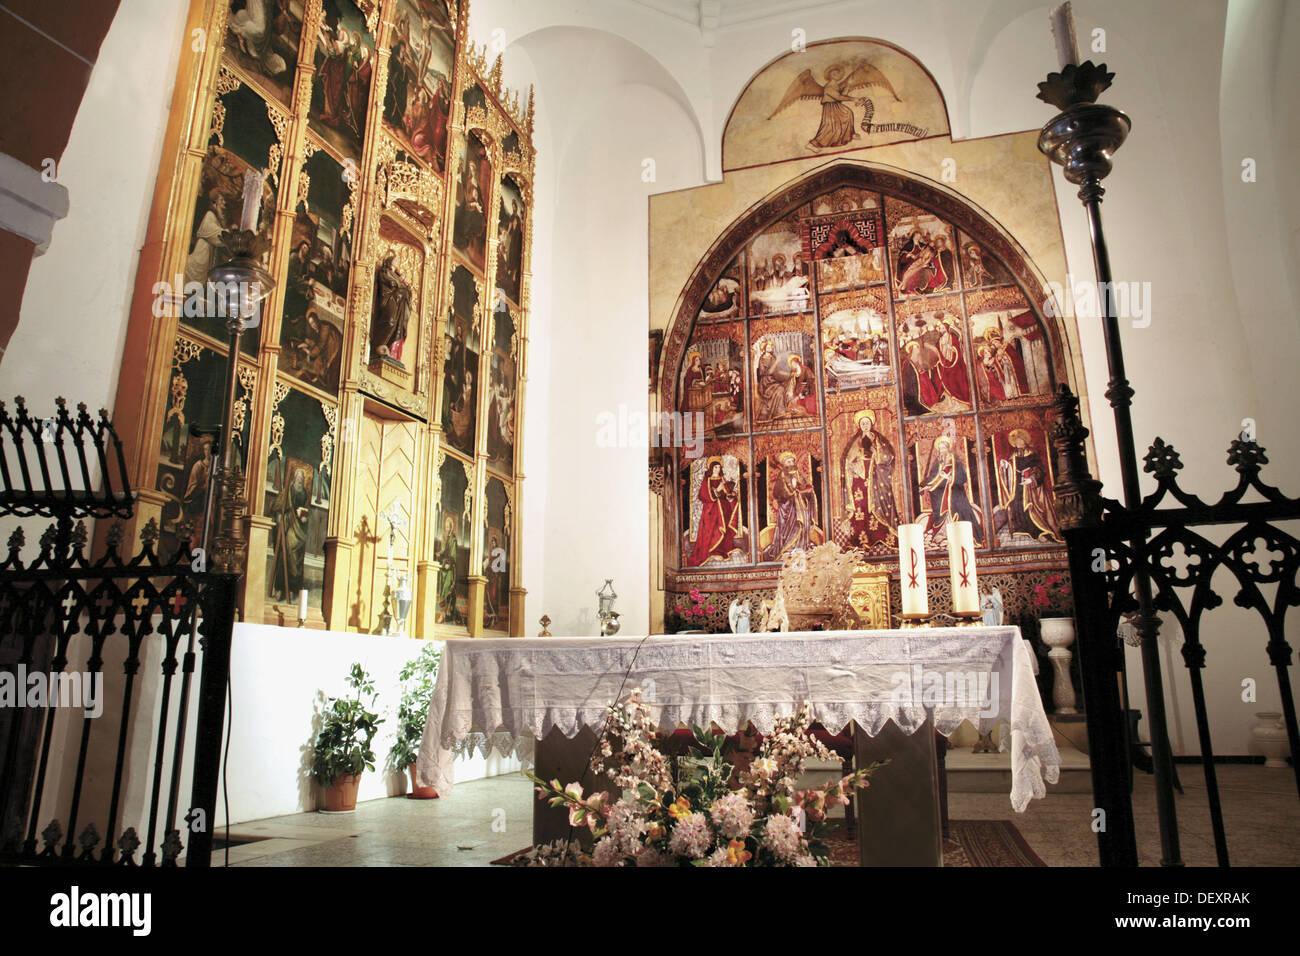 Church Saint Maria Magdalena With Stock Photos & Church Saint Maria ...